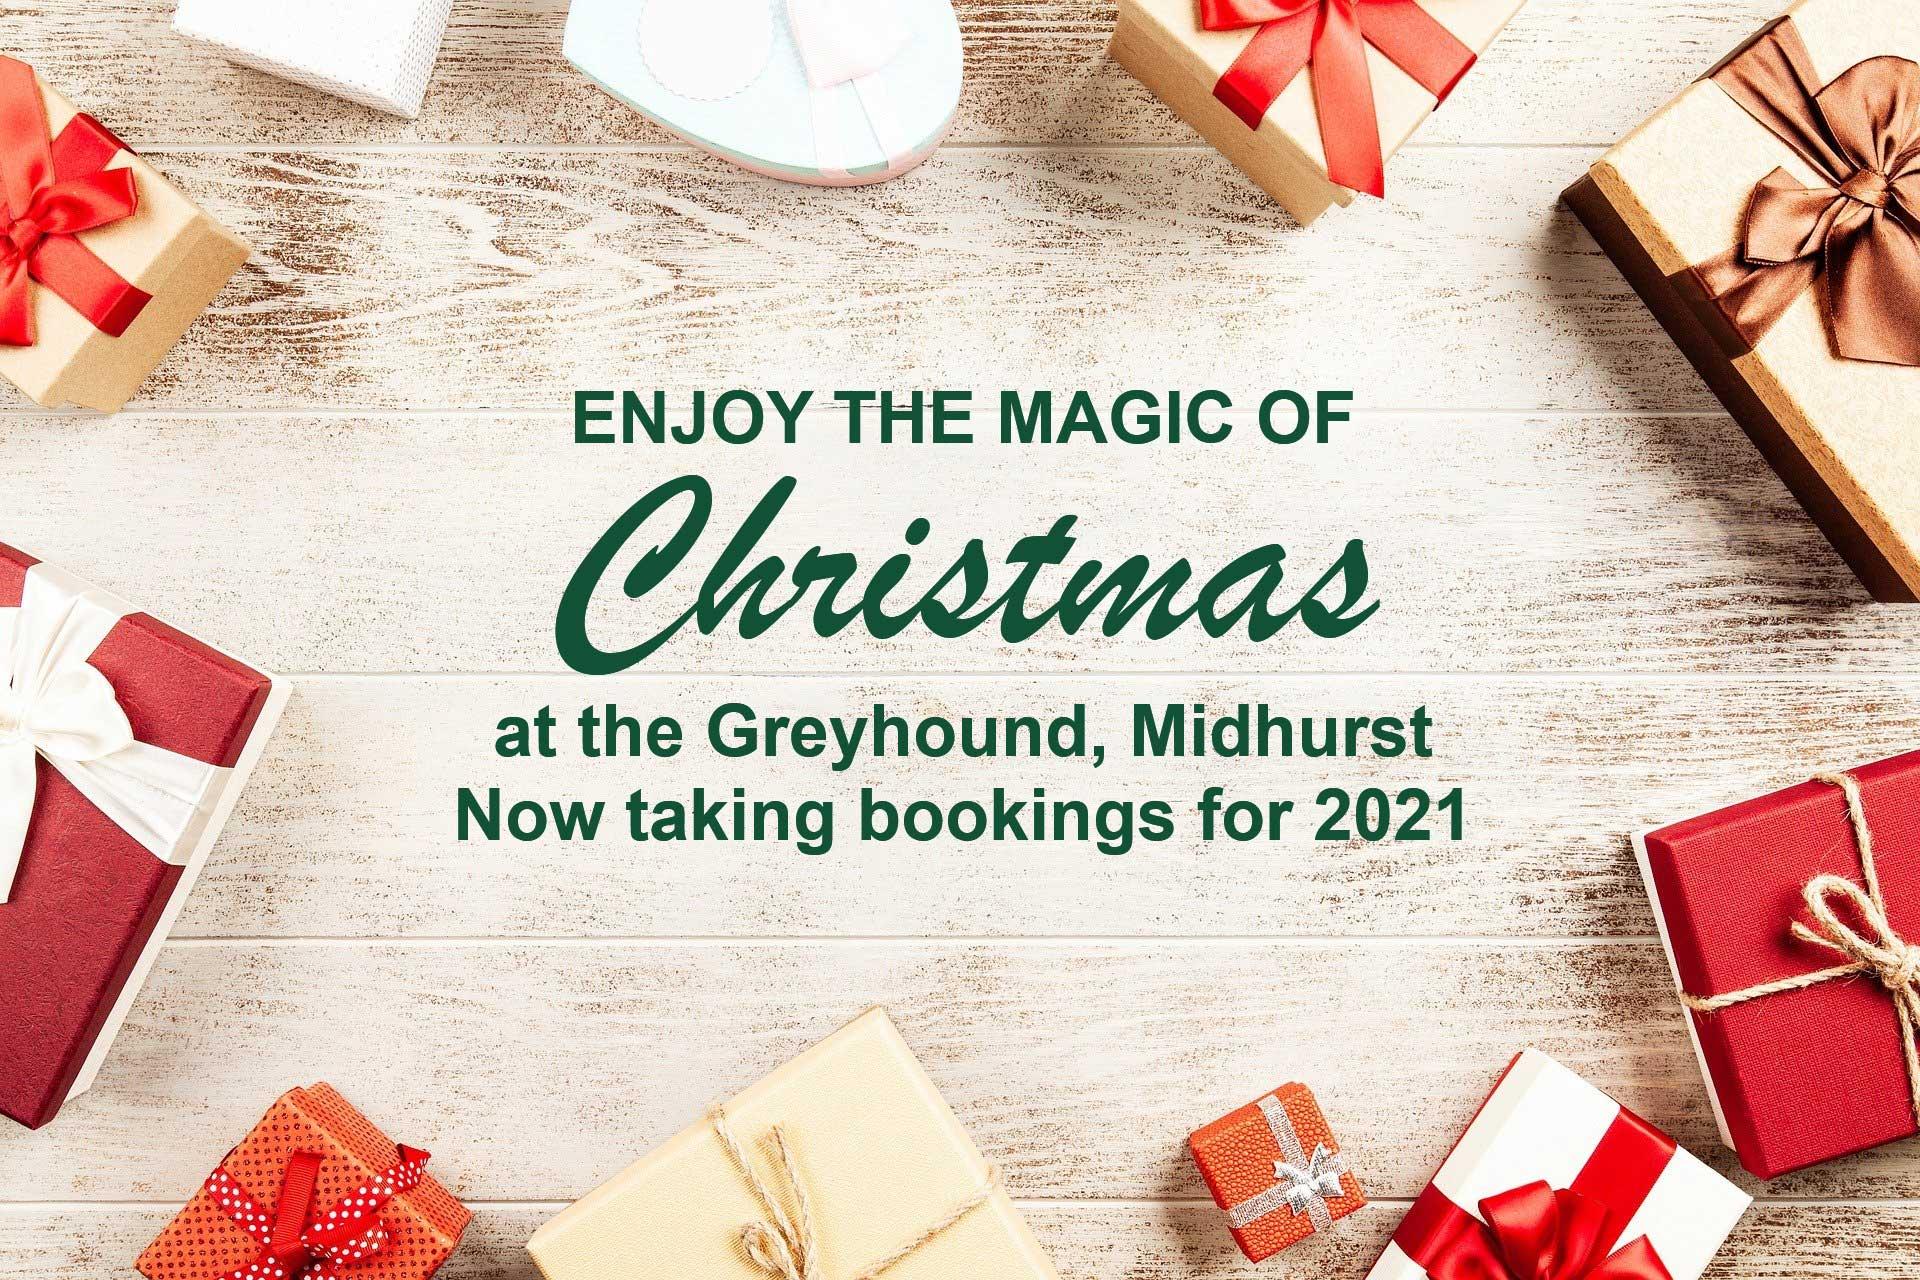 Enjoy the magic of Christmas at the Greyhound, Midhurst